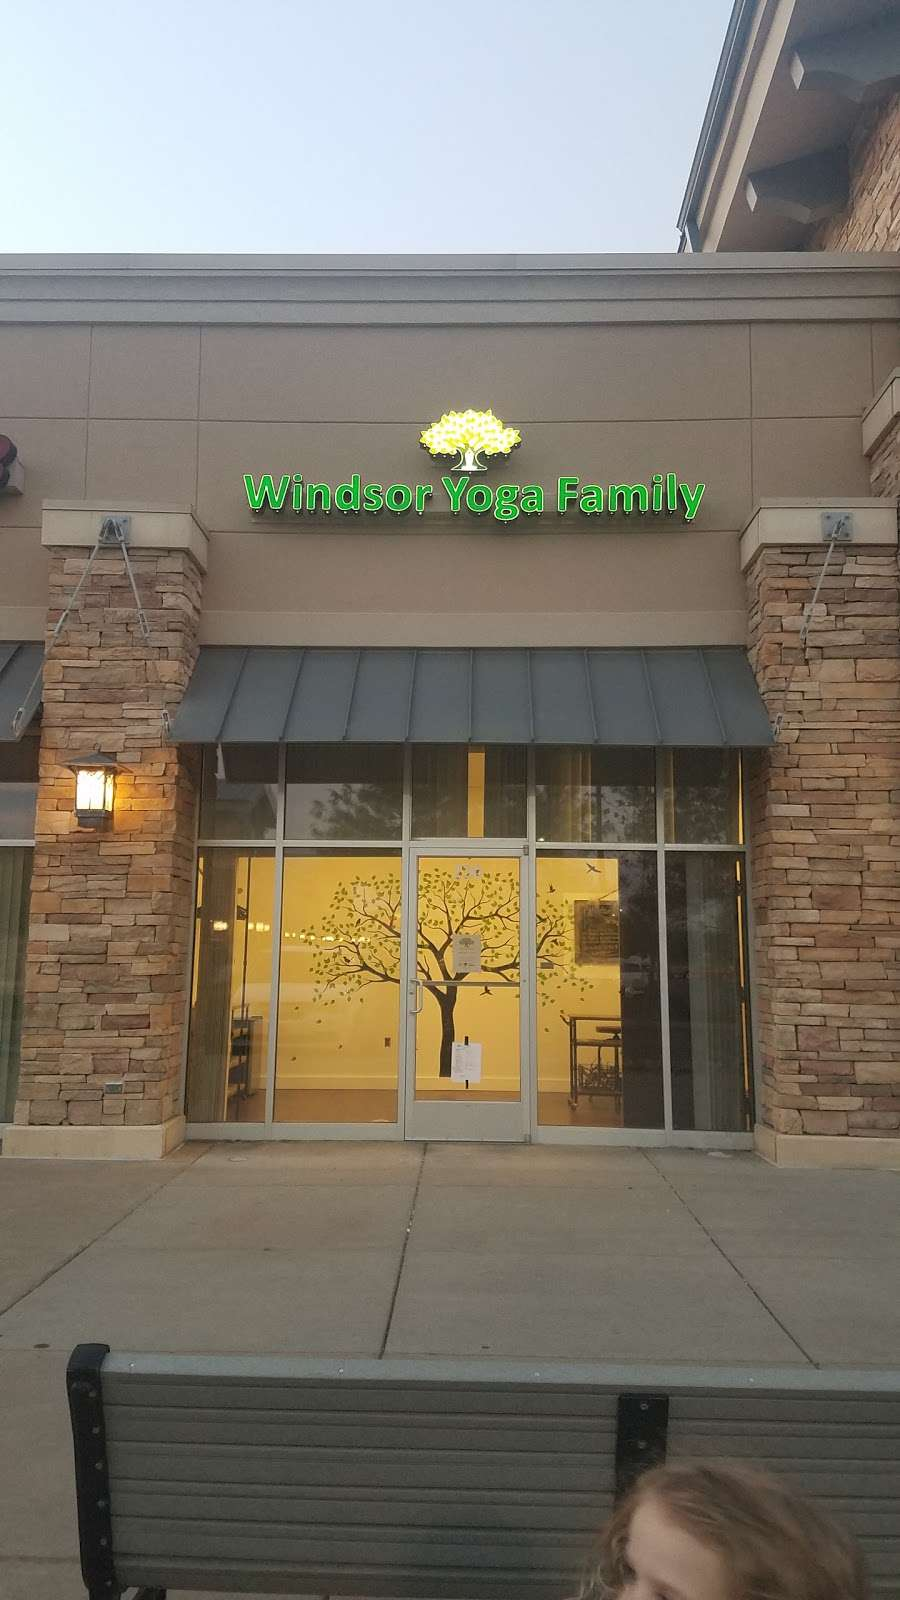 Windsor Yoga Family - gym  | Photo 4 of 9 | Address: 1520 Main St, Windsor, CO 80550, USA | Phone: (970) 481-7906